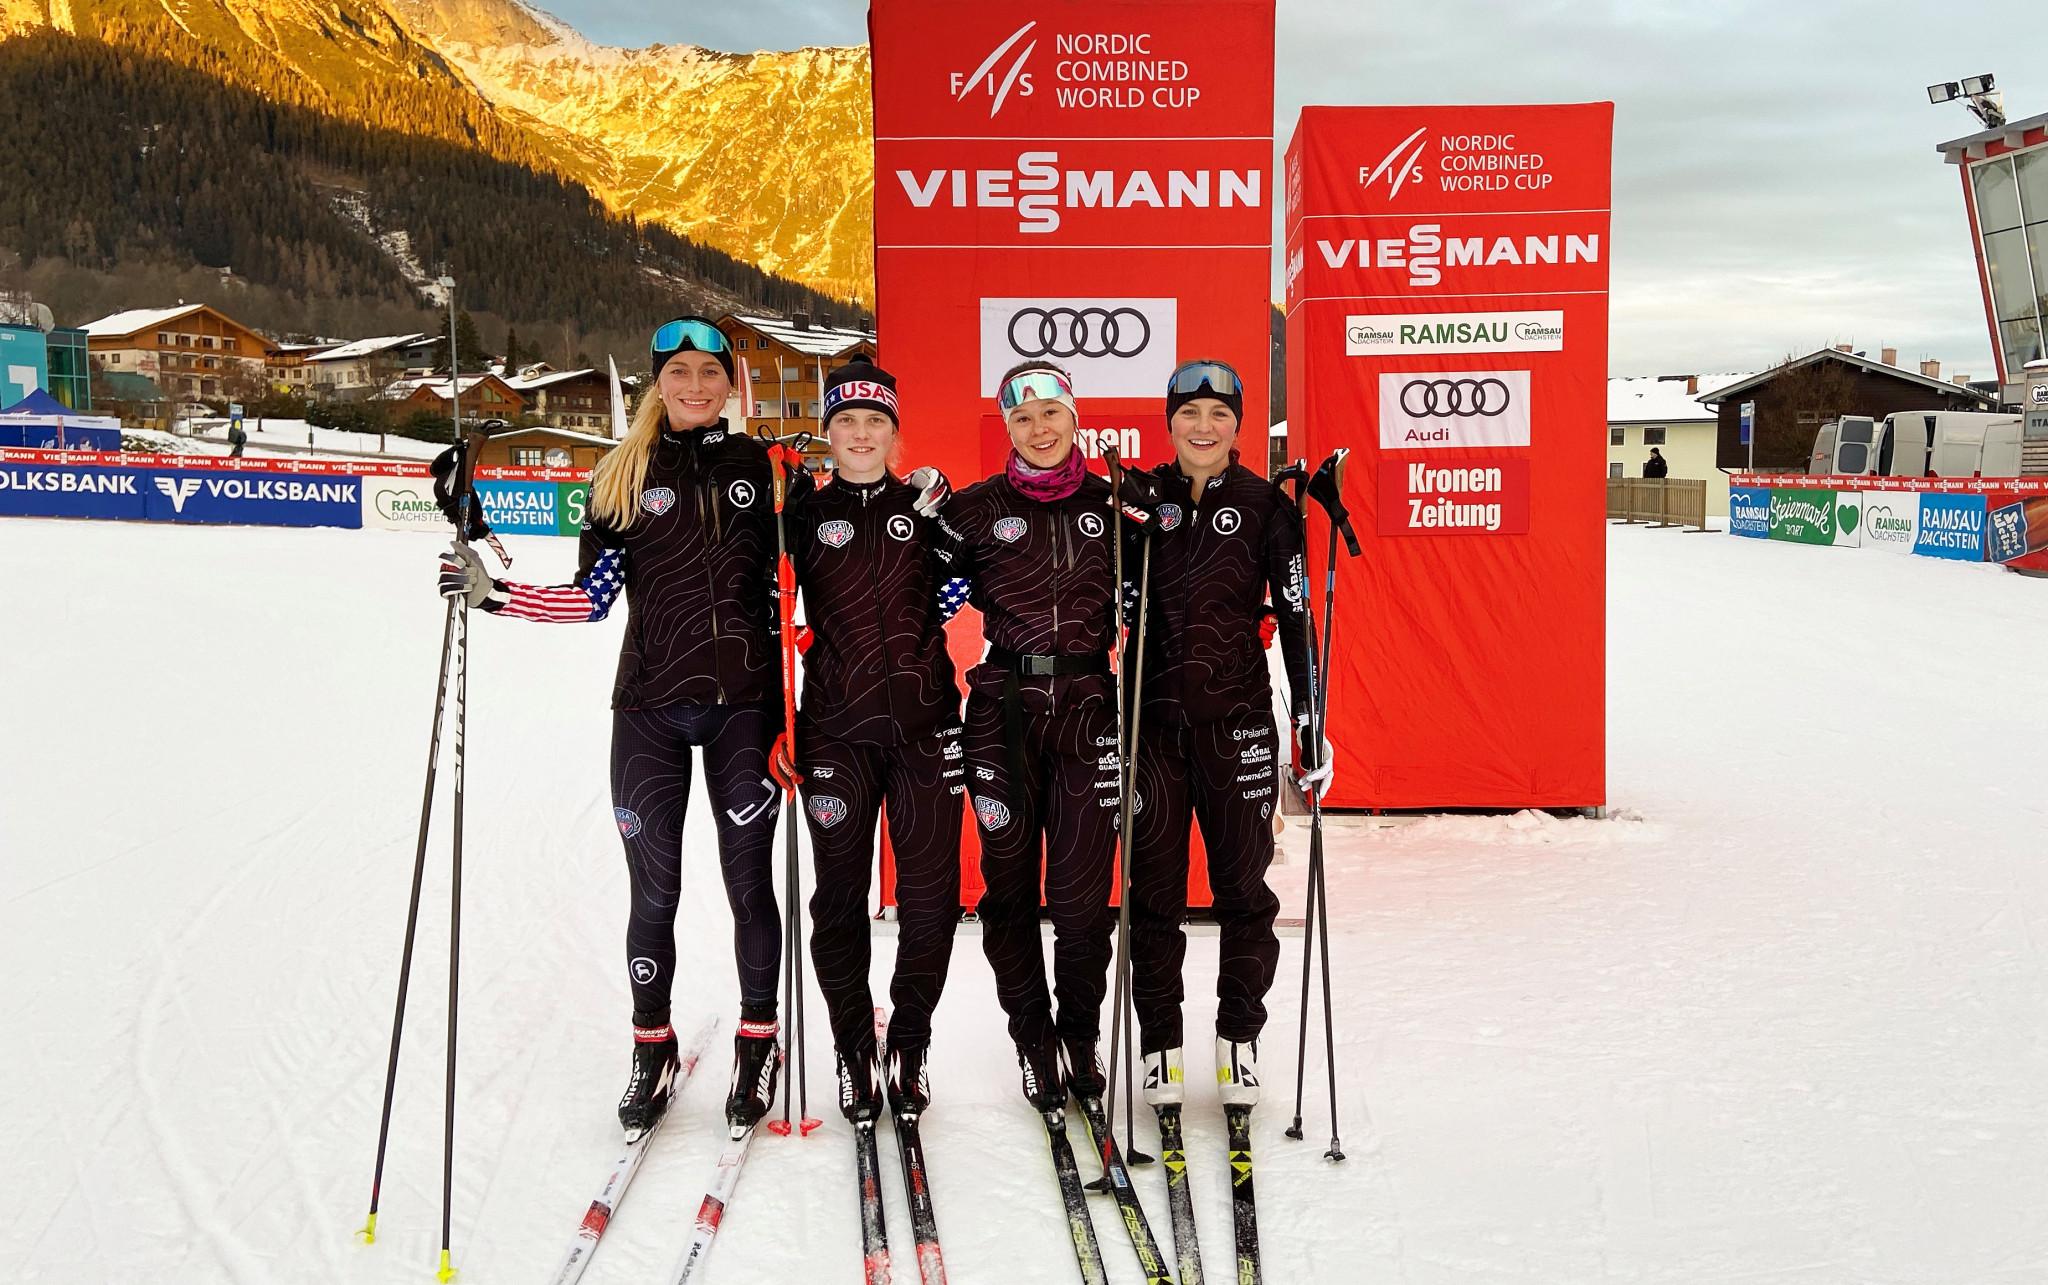 USA Nordic stars stand out among rivals thanks to new Podiumwear uniform